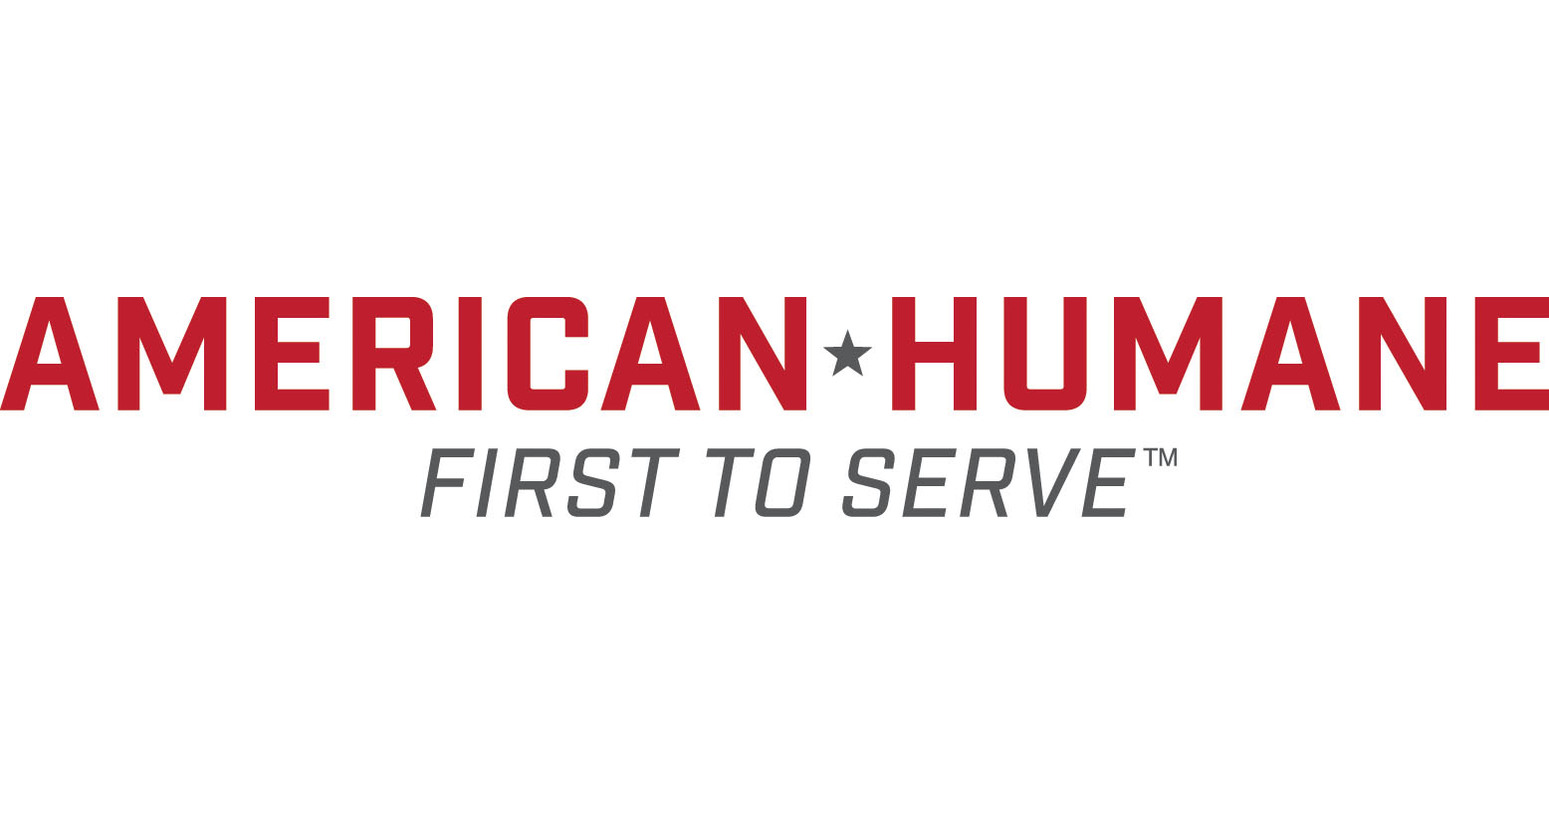 american_humane_association_logo.jpg